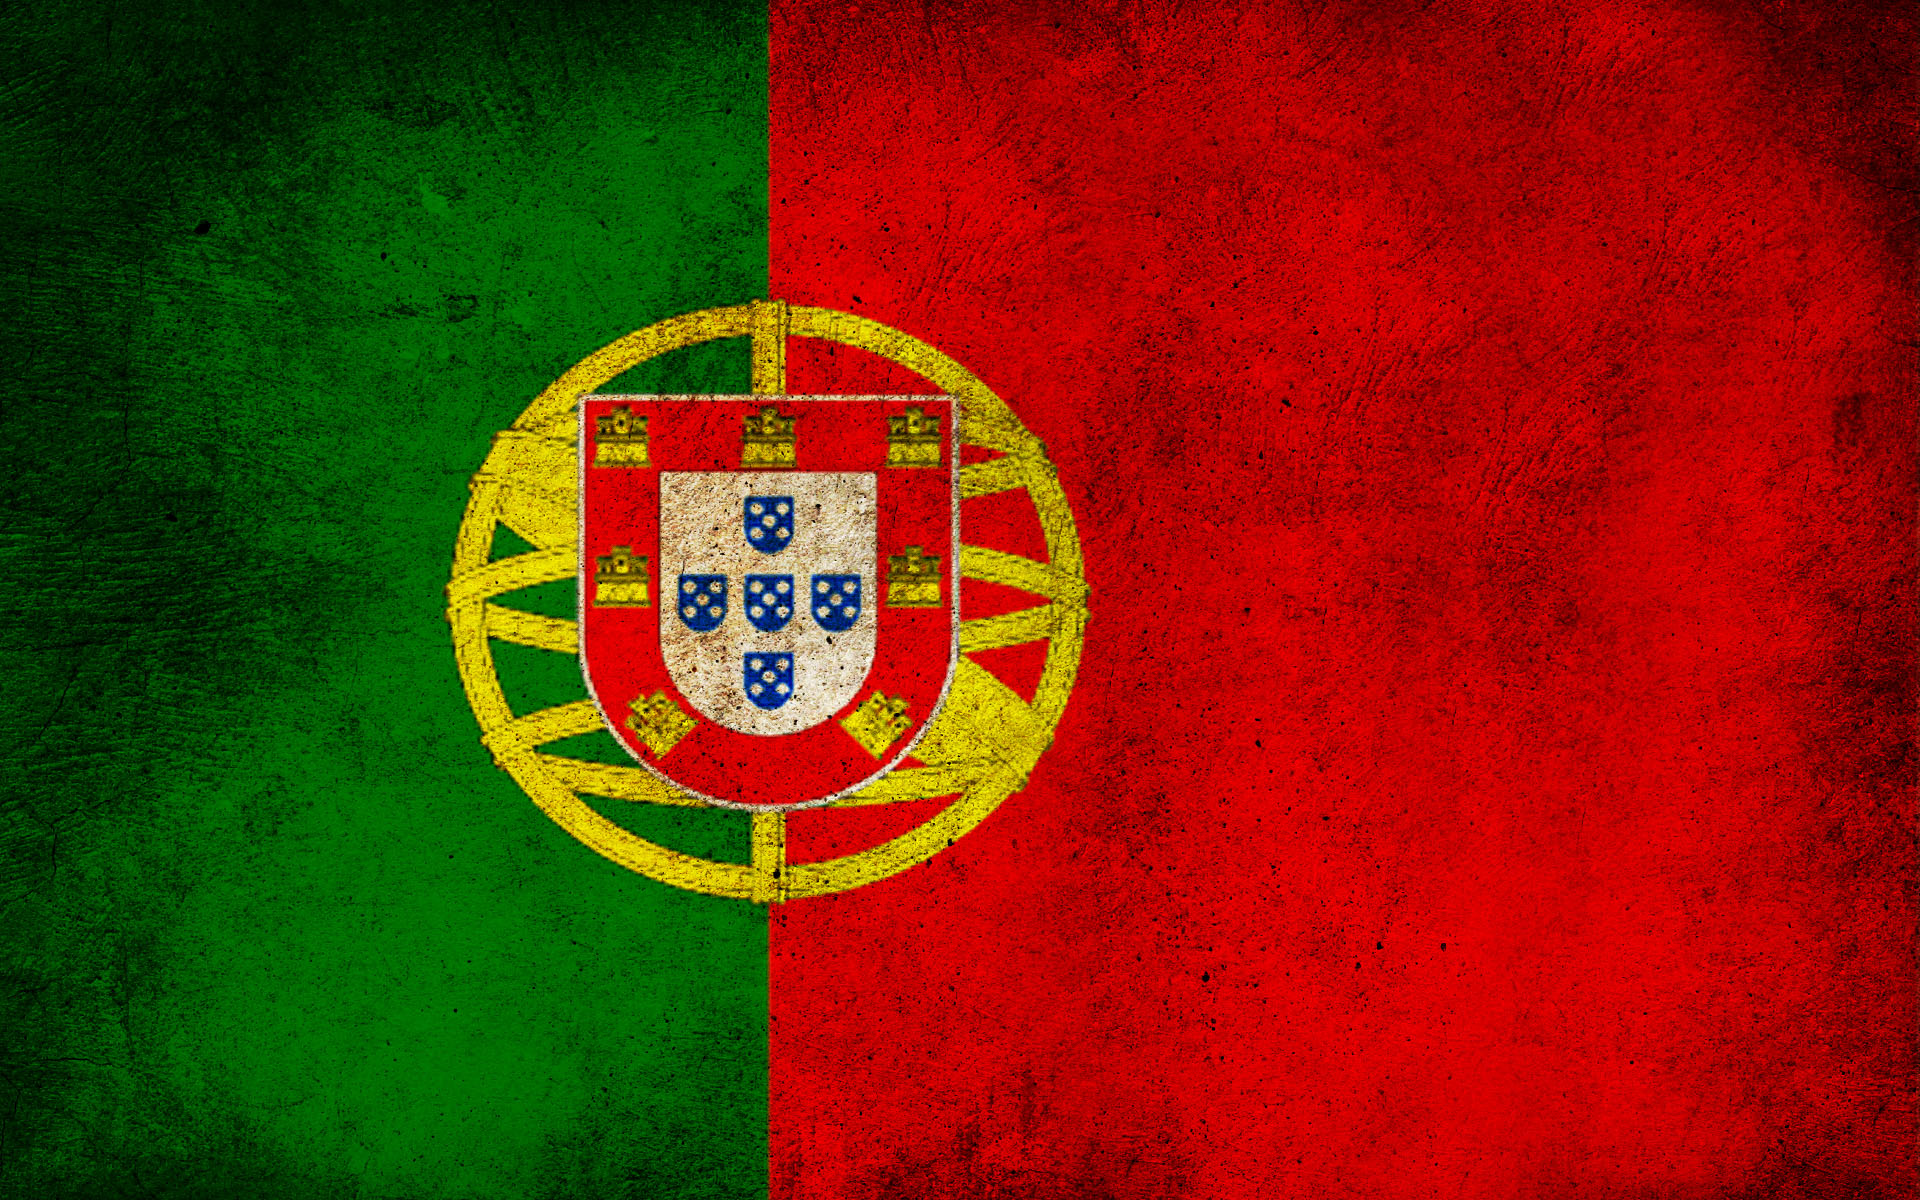 portugal - photo #10